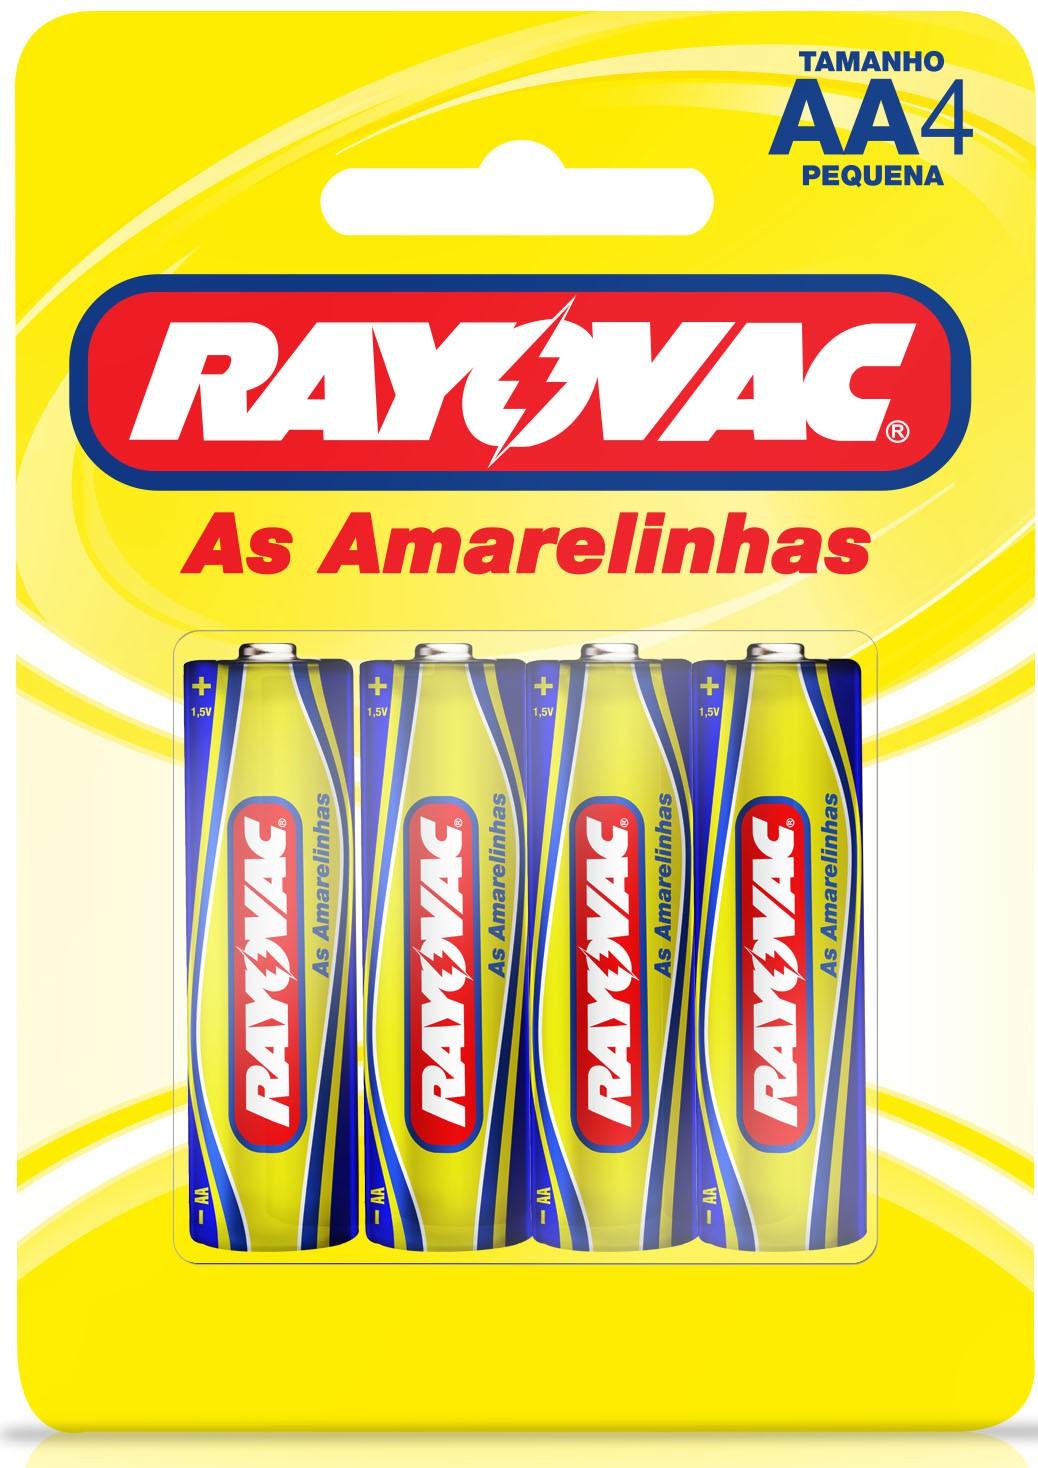 36 Pilhas AA Zinco Carvão RAYOVAC 9 cartelas